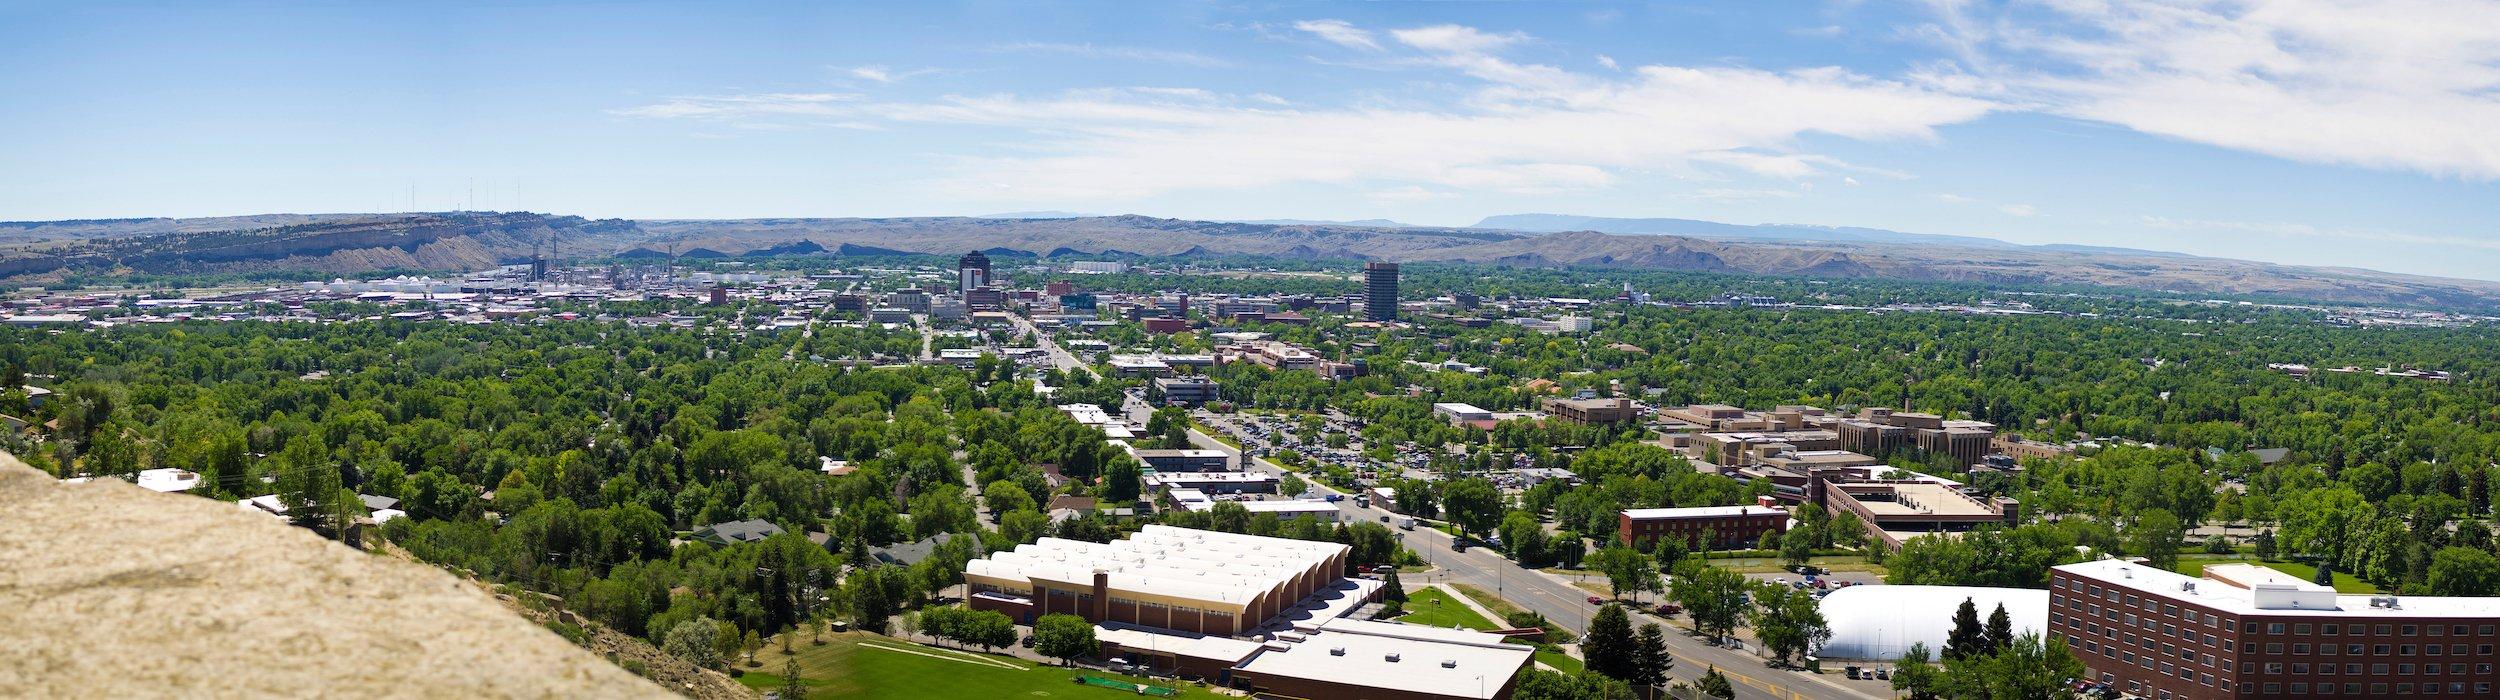 Billings, Montana rx